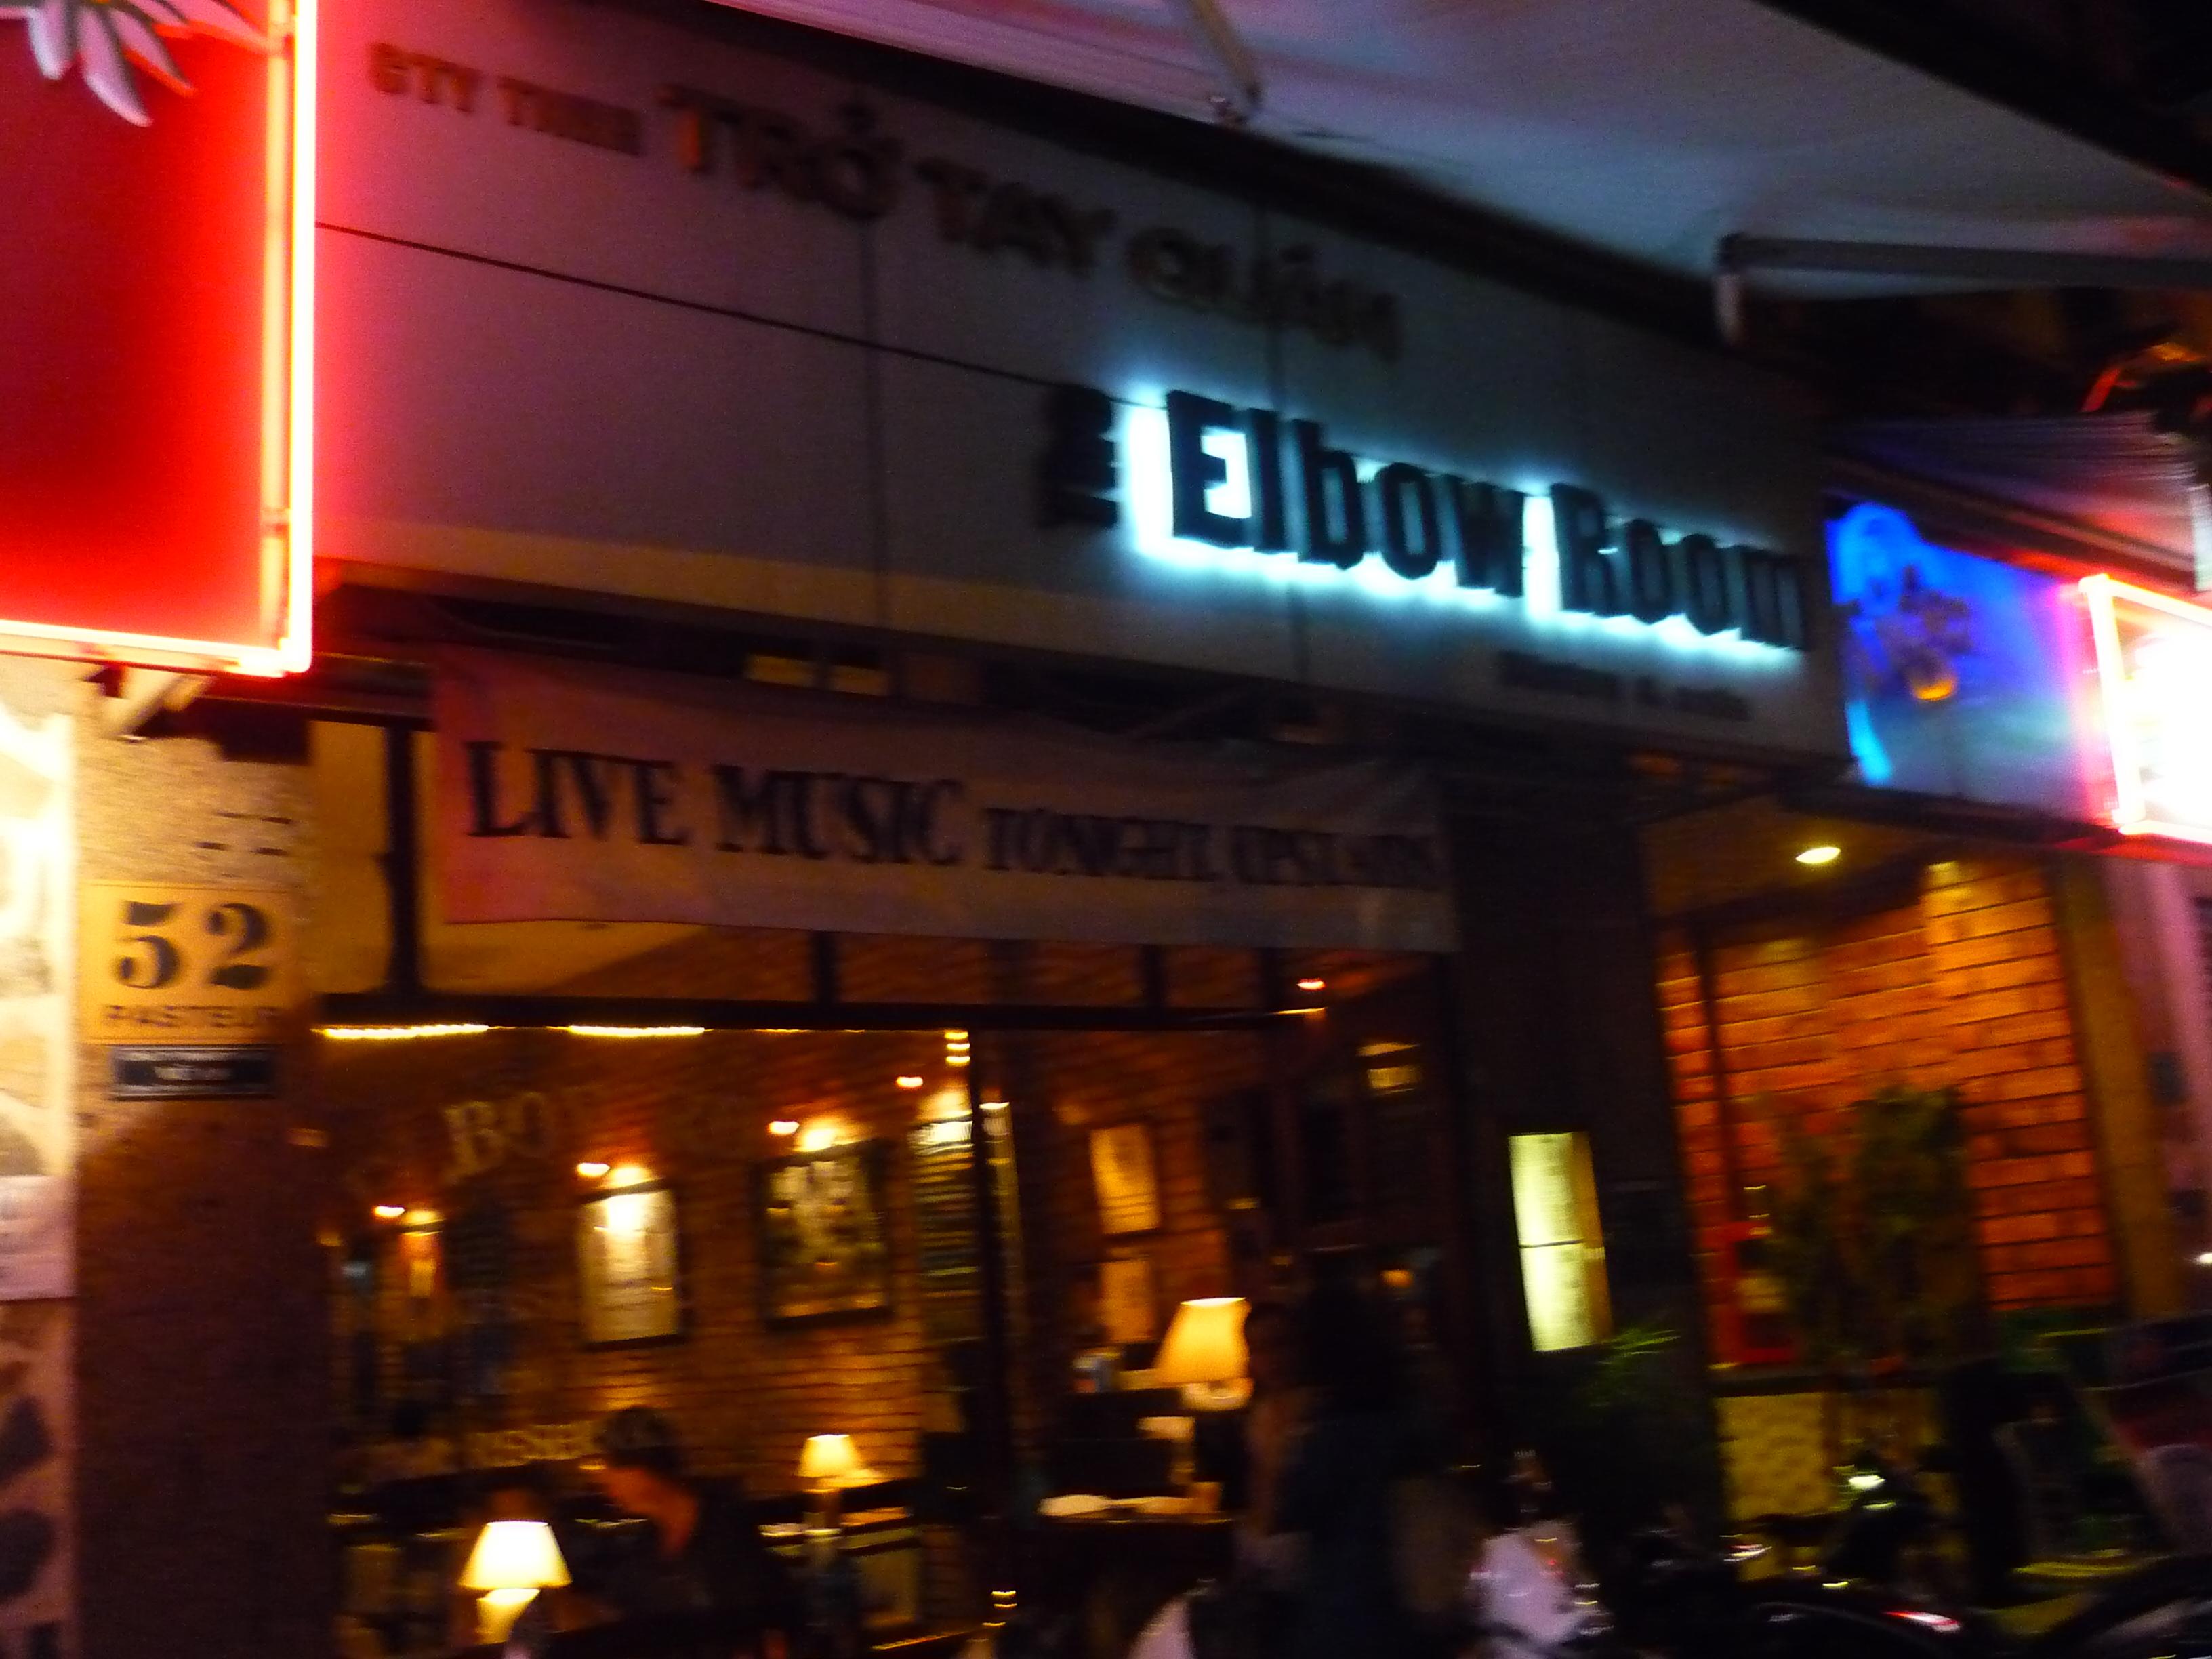 The Elbow room, Saigon | eatingmodern